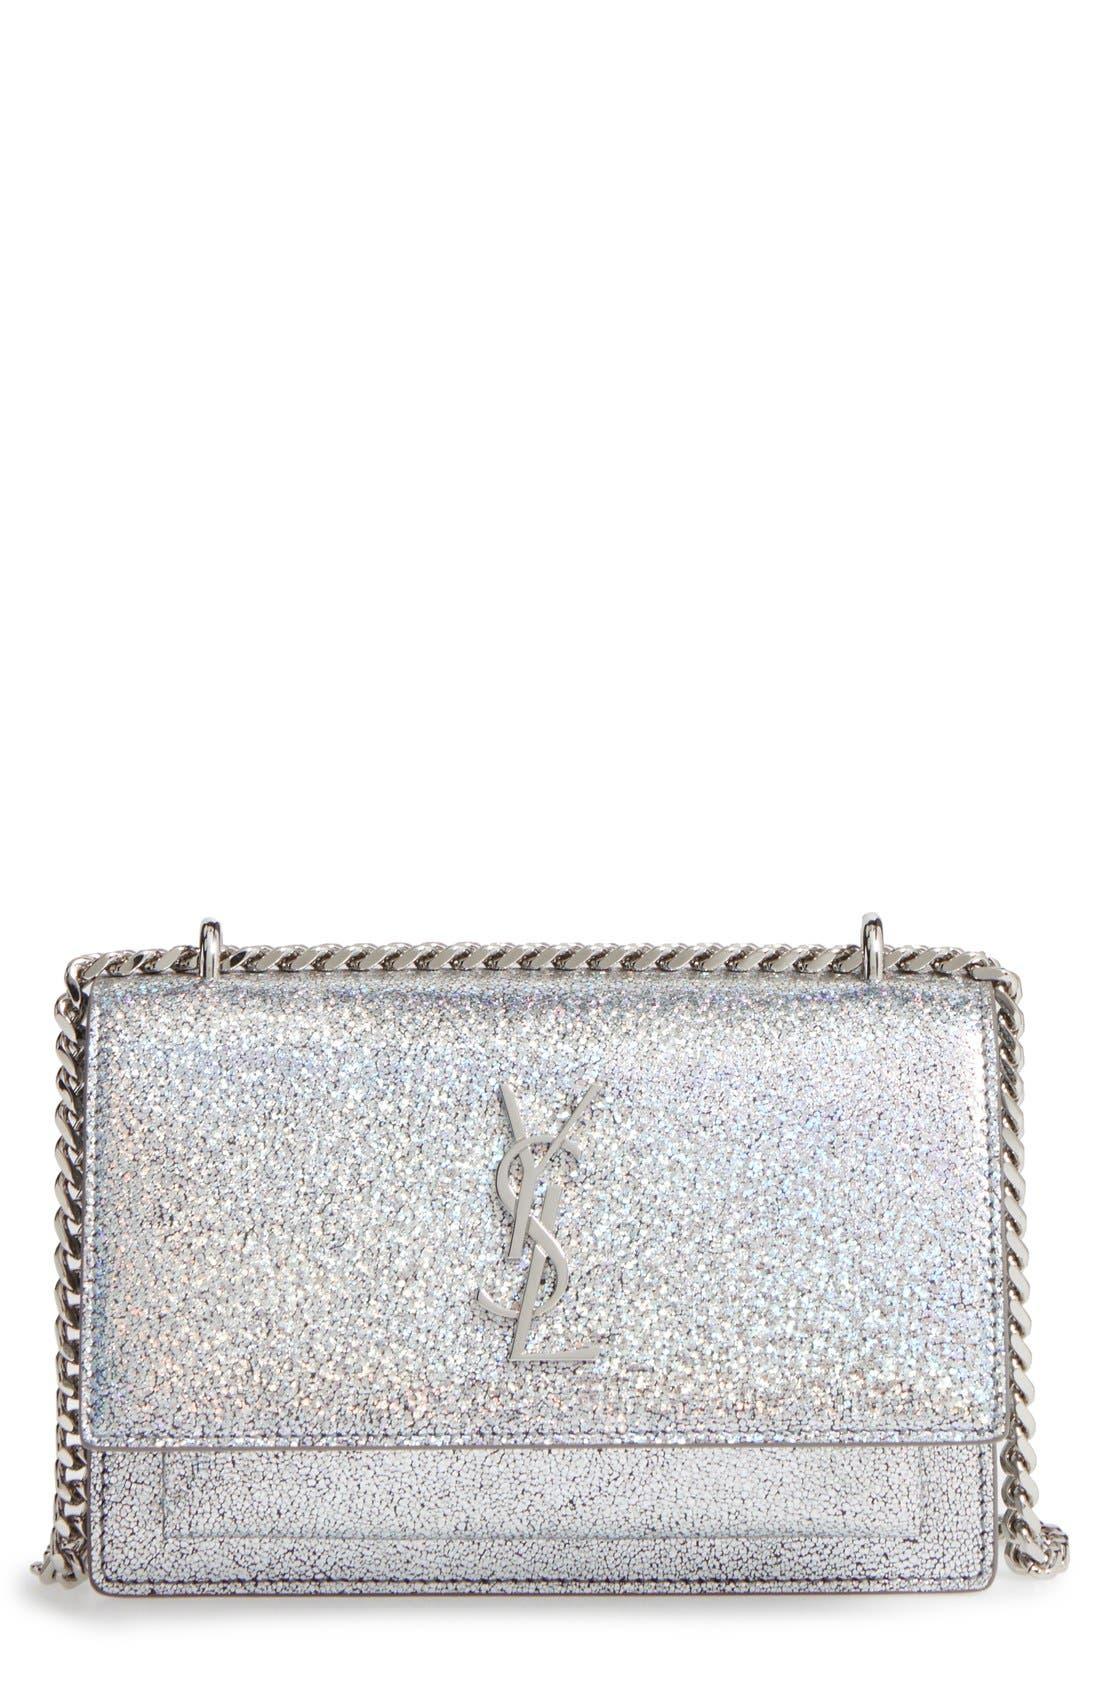 Saint Laurent Mini Sunset Crackle Metallic Leather Crossbody Bag